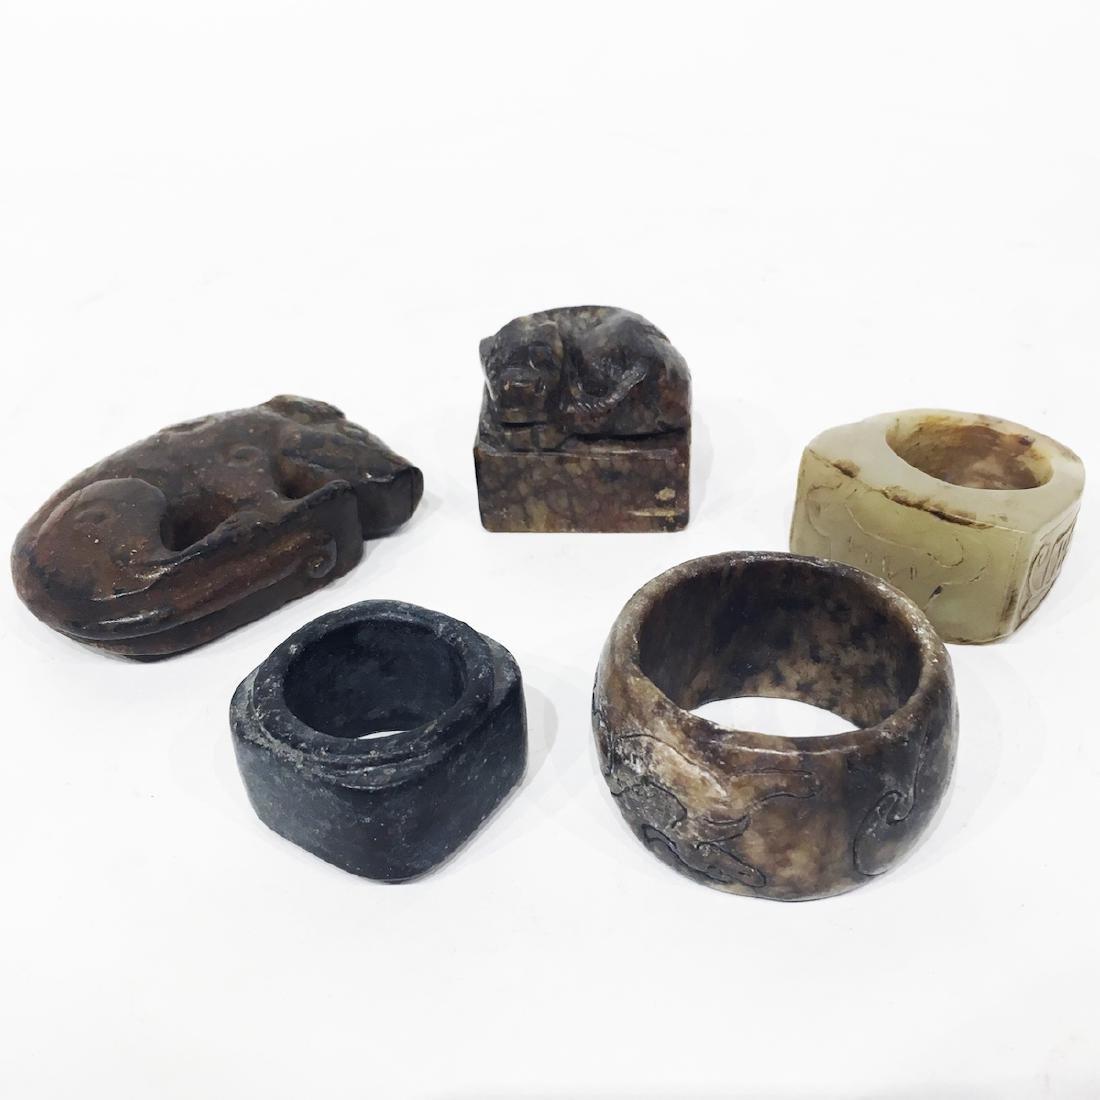 Archaic Nephrite Jade pieces